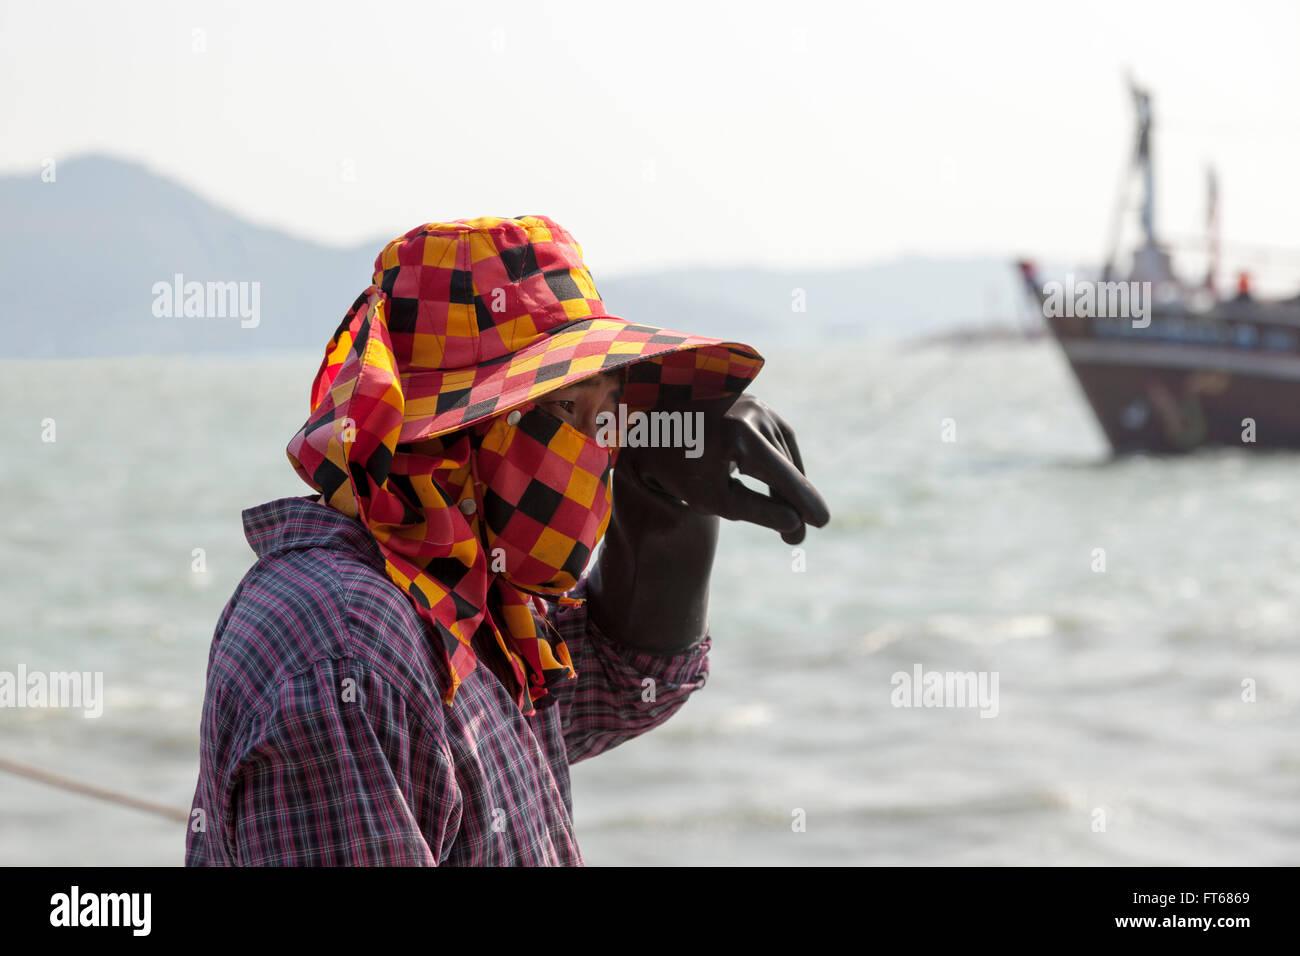 A fisherman protecting his head from the intense sun reflection (Ao Khlong Wan - Prachuap Khiri Khan province - - Stock Image